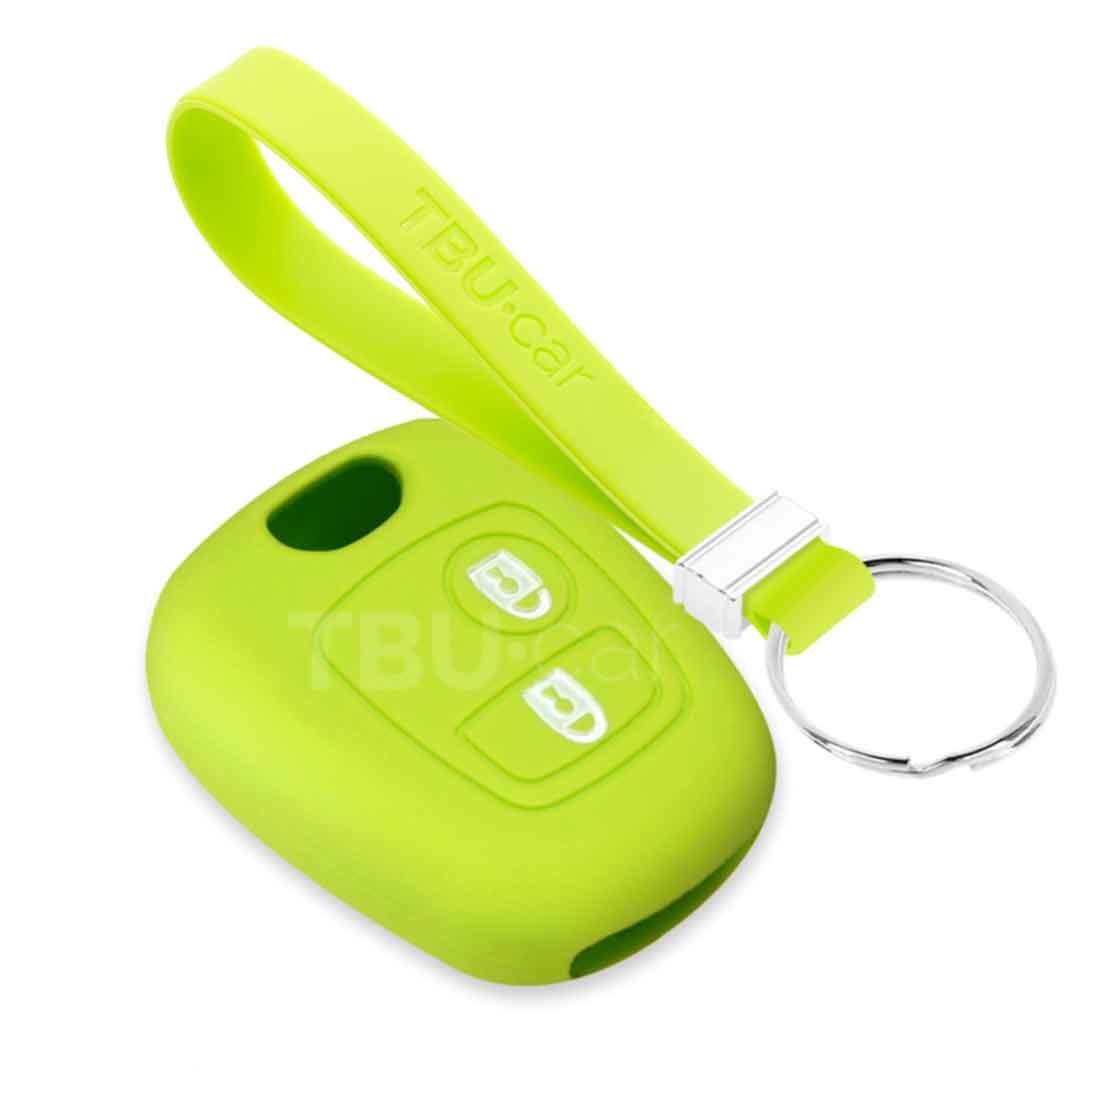 TBU car TBU car Autoschlüssel Hülle kompatibel mit Toyota 2 Tasten - Schutzhülle aus Silikon - Auto Schlüsselhülle Cover in Lindgrün